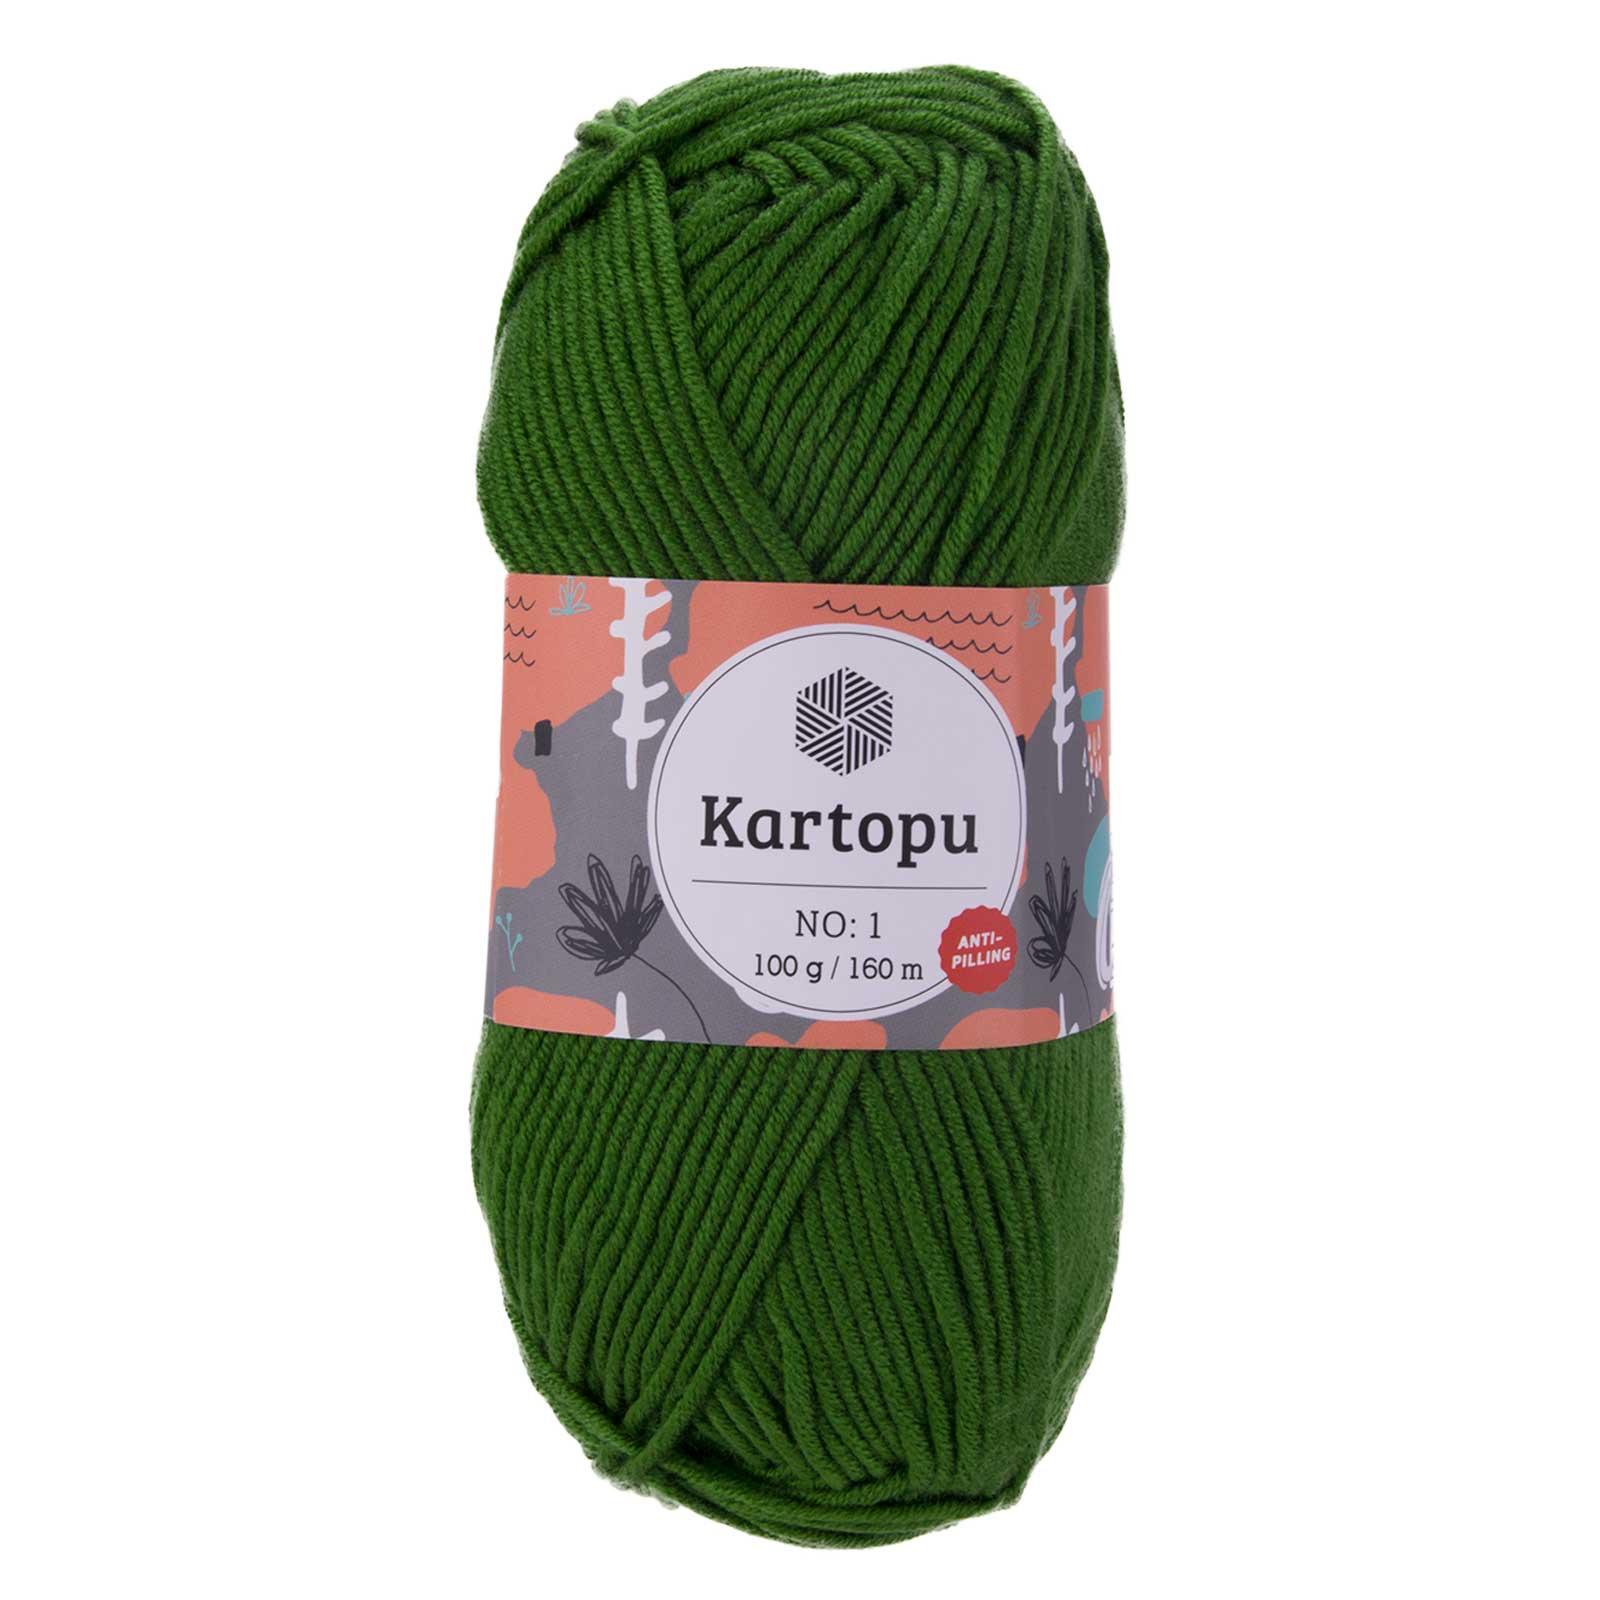 100g Strickwolle Kartopu NO:1 Polyacryl-Strickgarn Wolle Anti Pilling Effekt – Bild 9